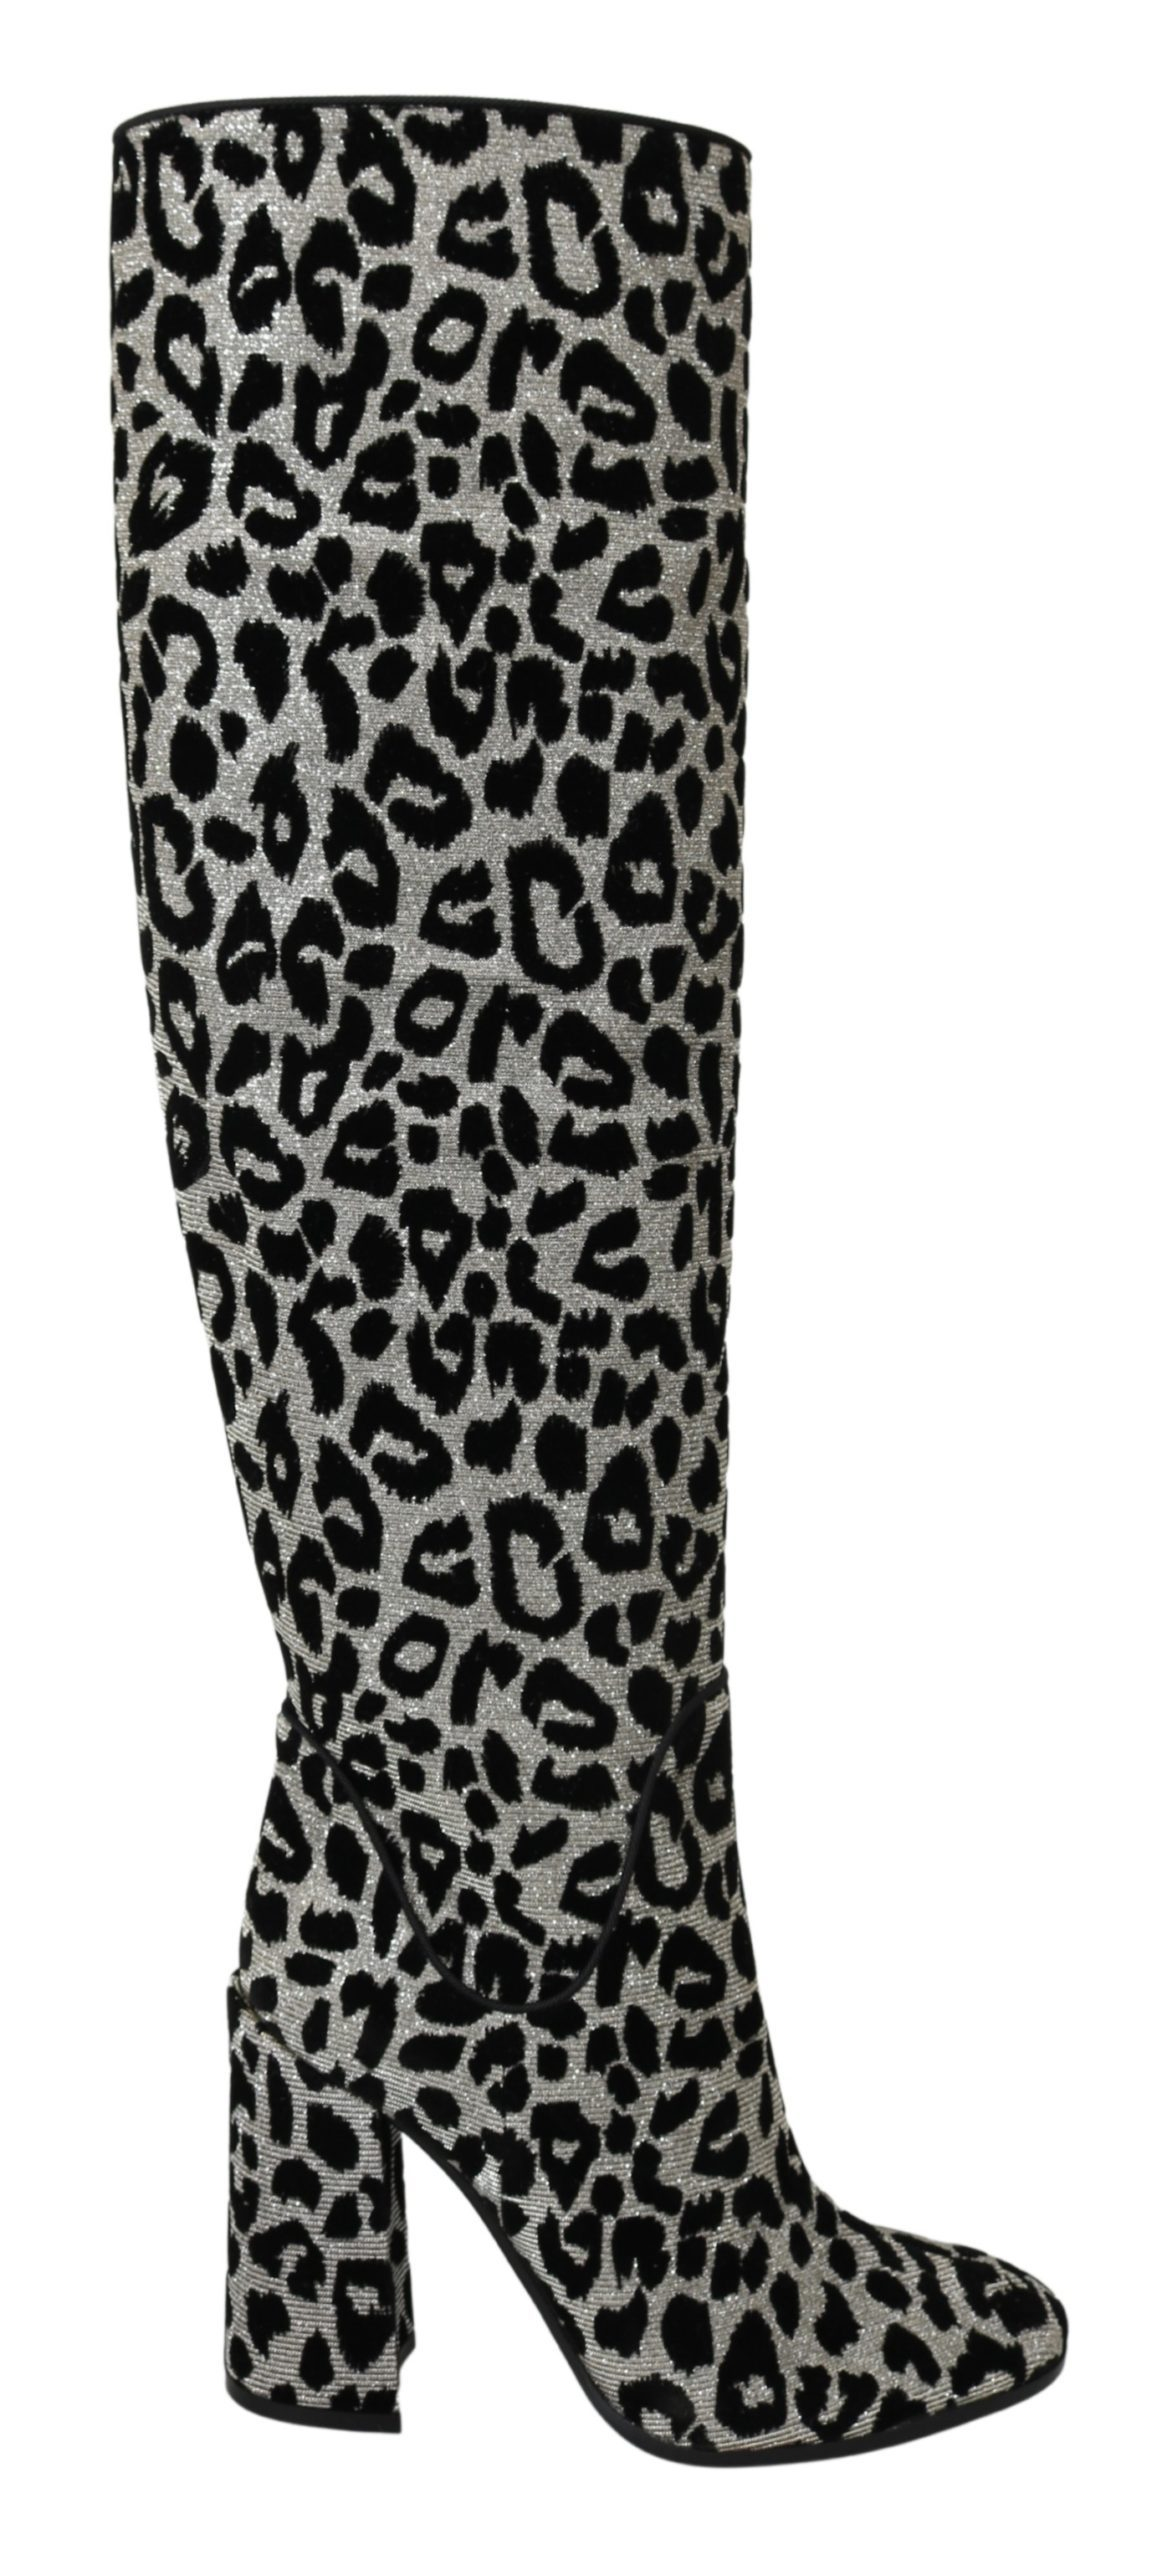 Dolce & Gabbana Women's Leopard Knee High Boot Black LA7087 - EU39.5/US9